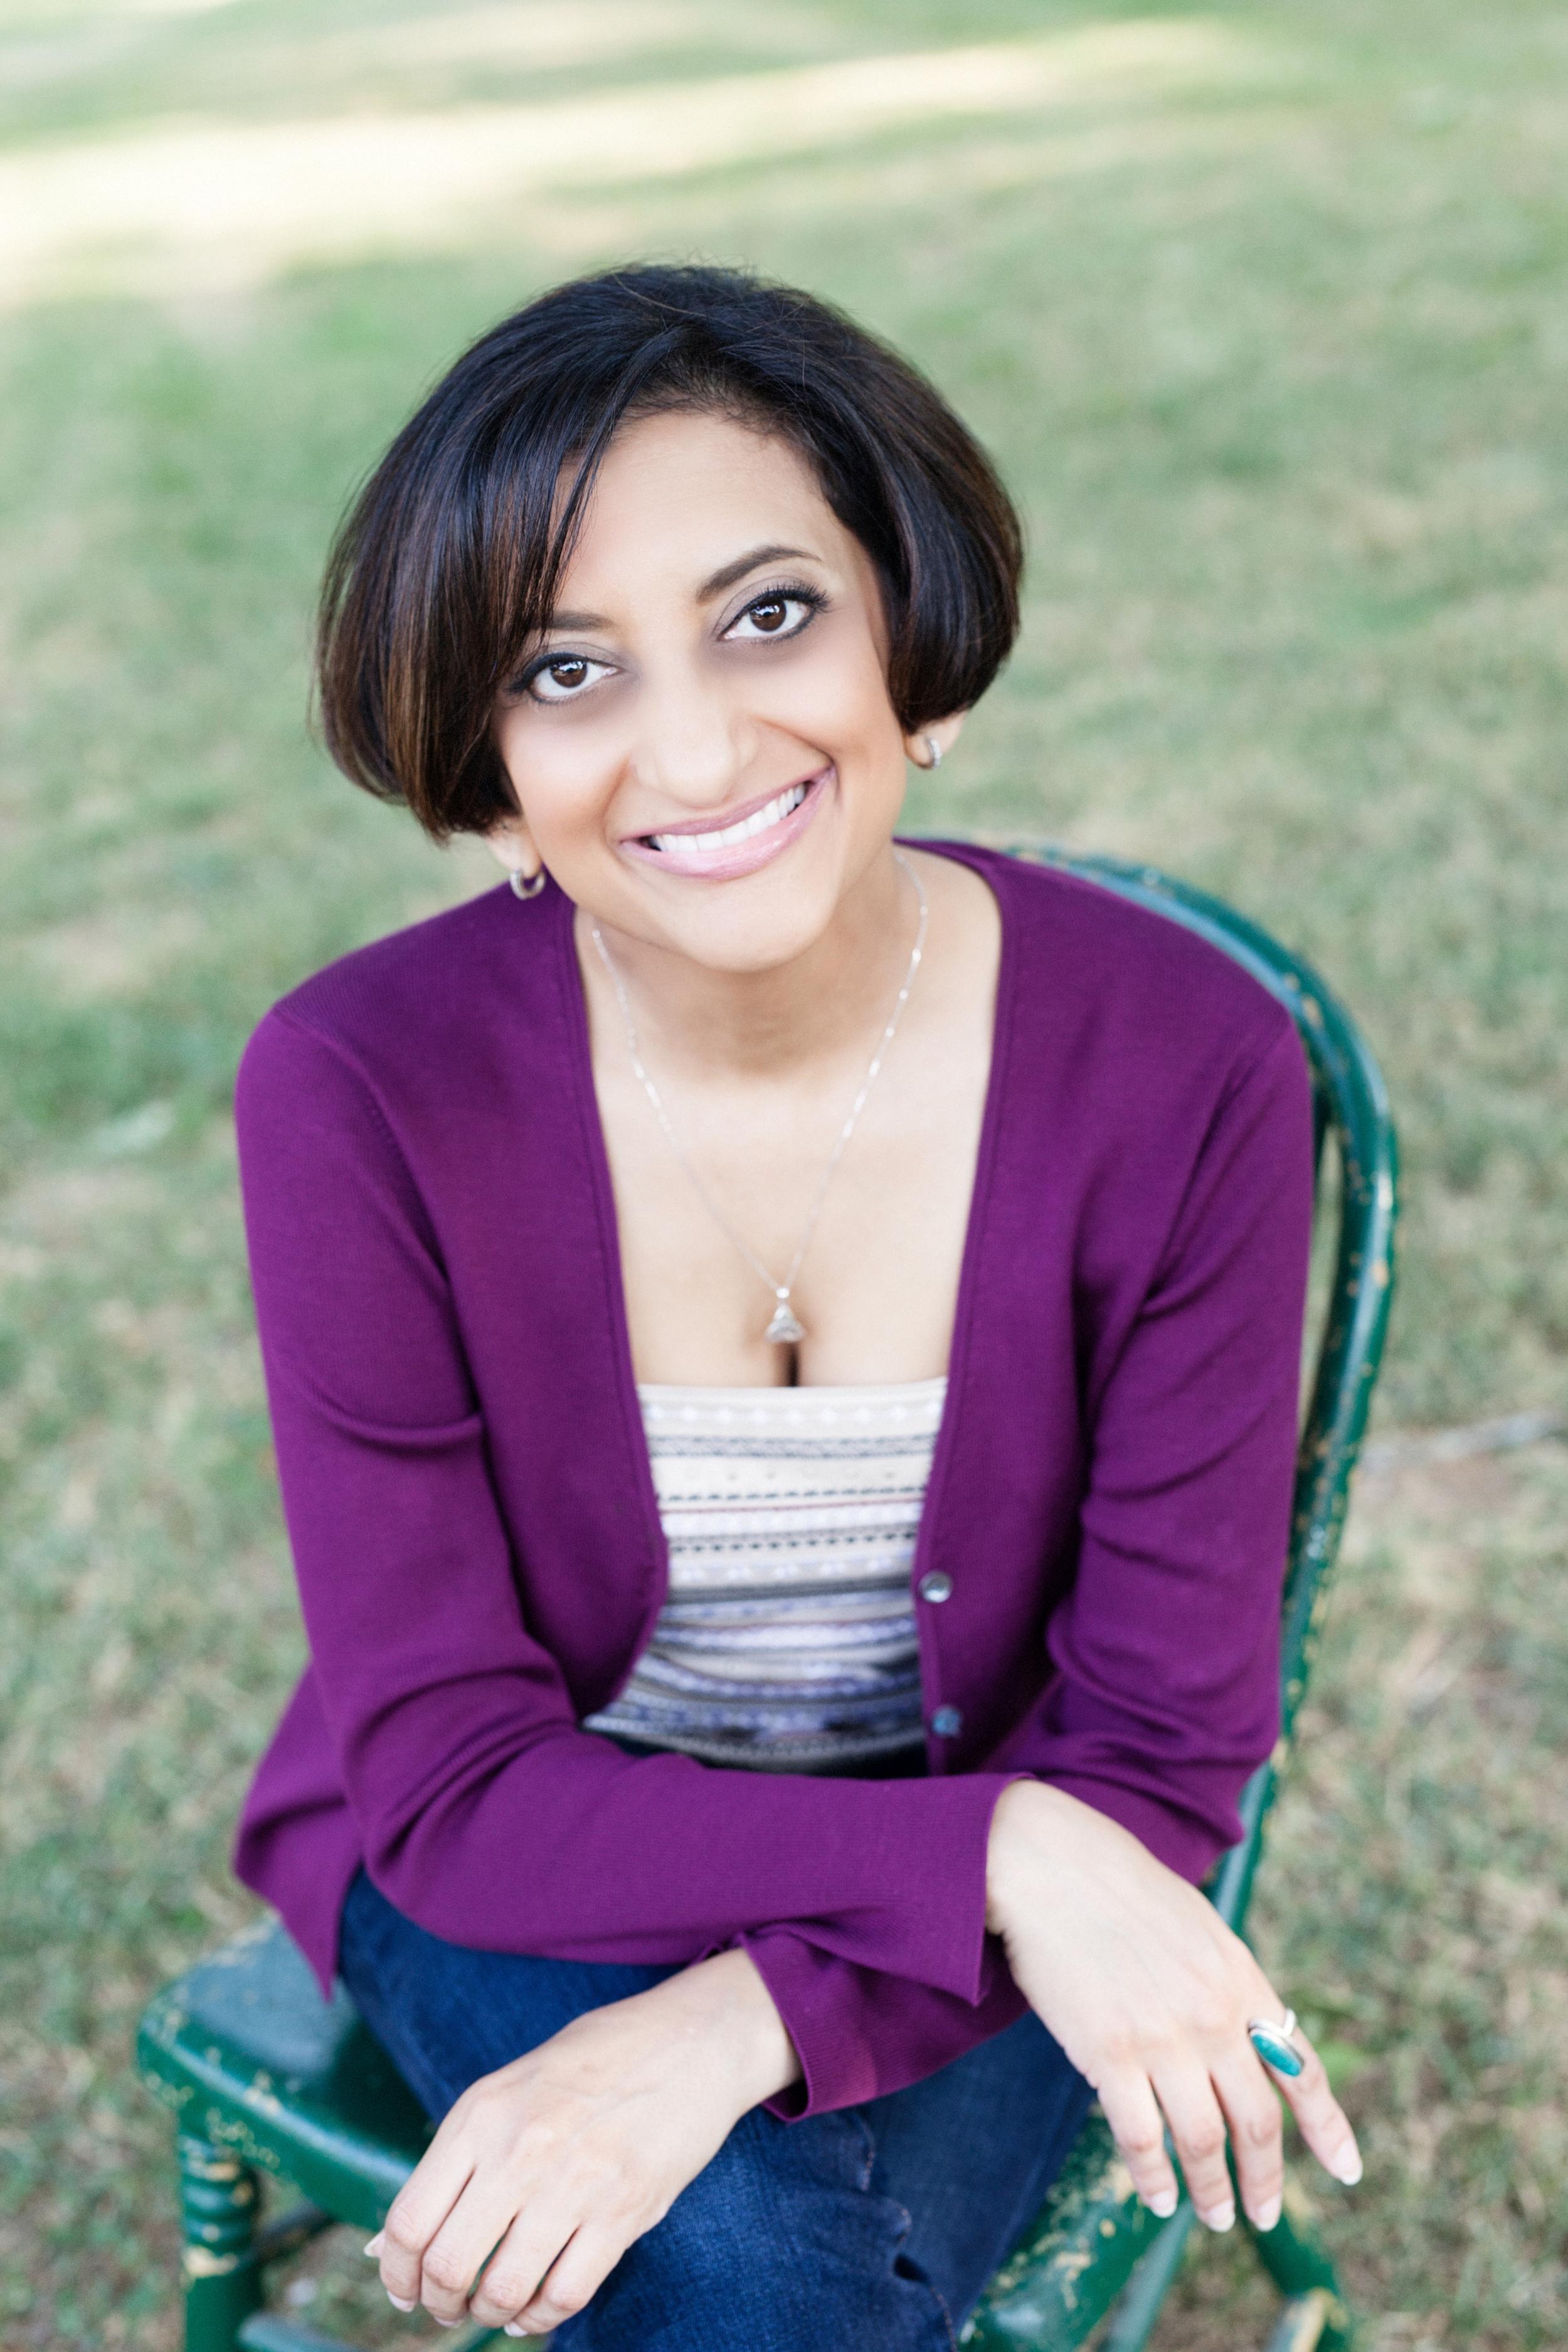 Headshot photographer charlotte nc-lindsay wynne photography-author headshot-Shaila Patel 08.jpg